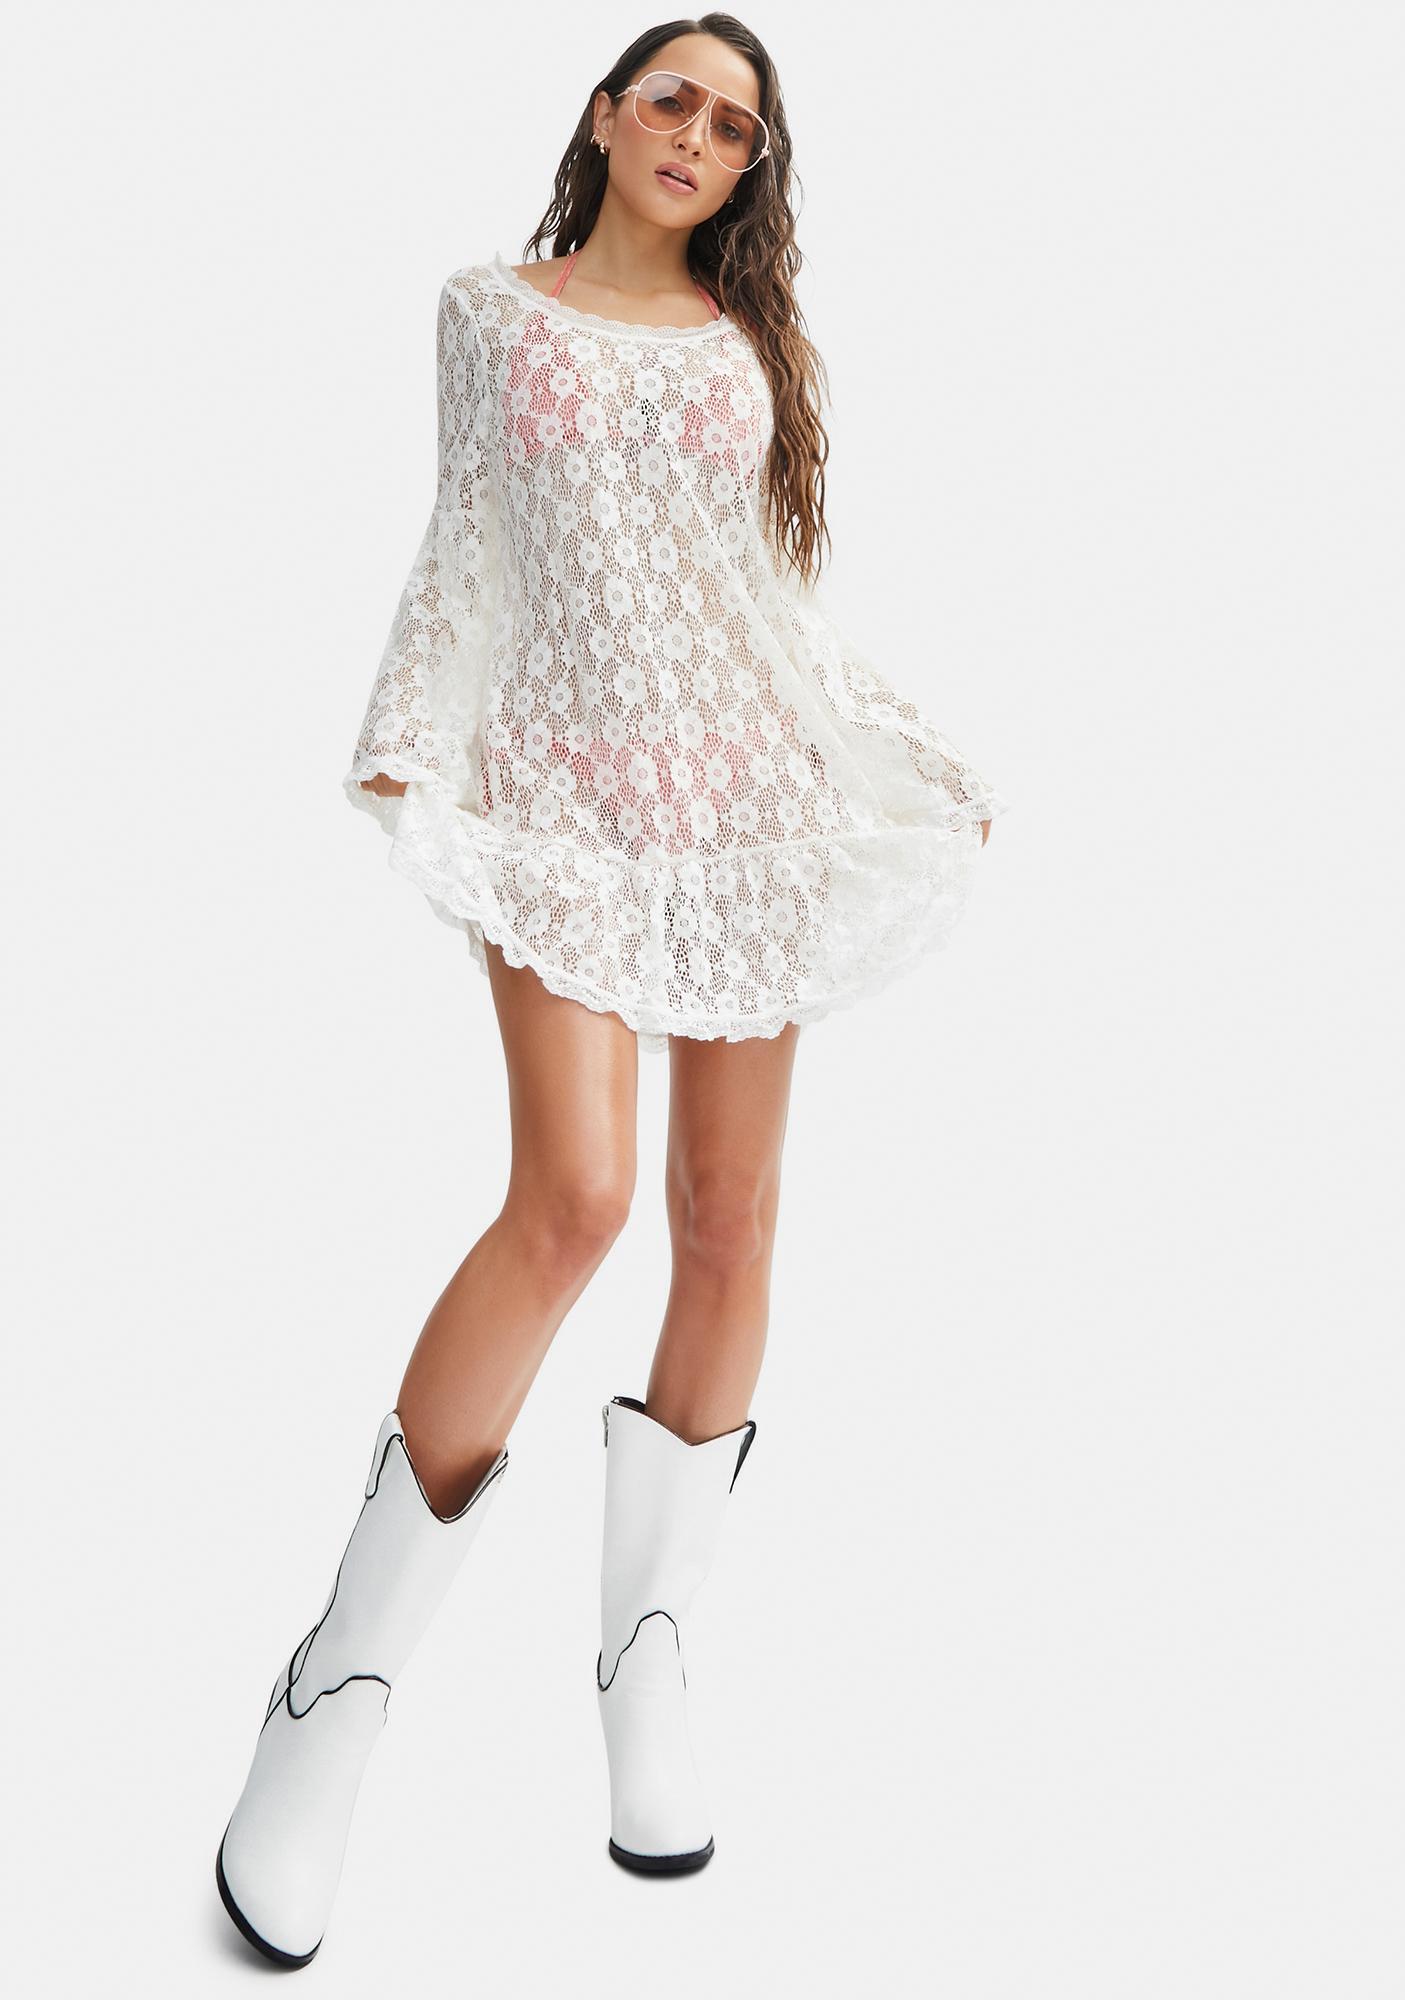 Power 2 the Flower Crochet Isabella Daisy Dress